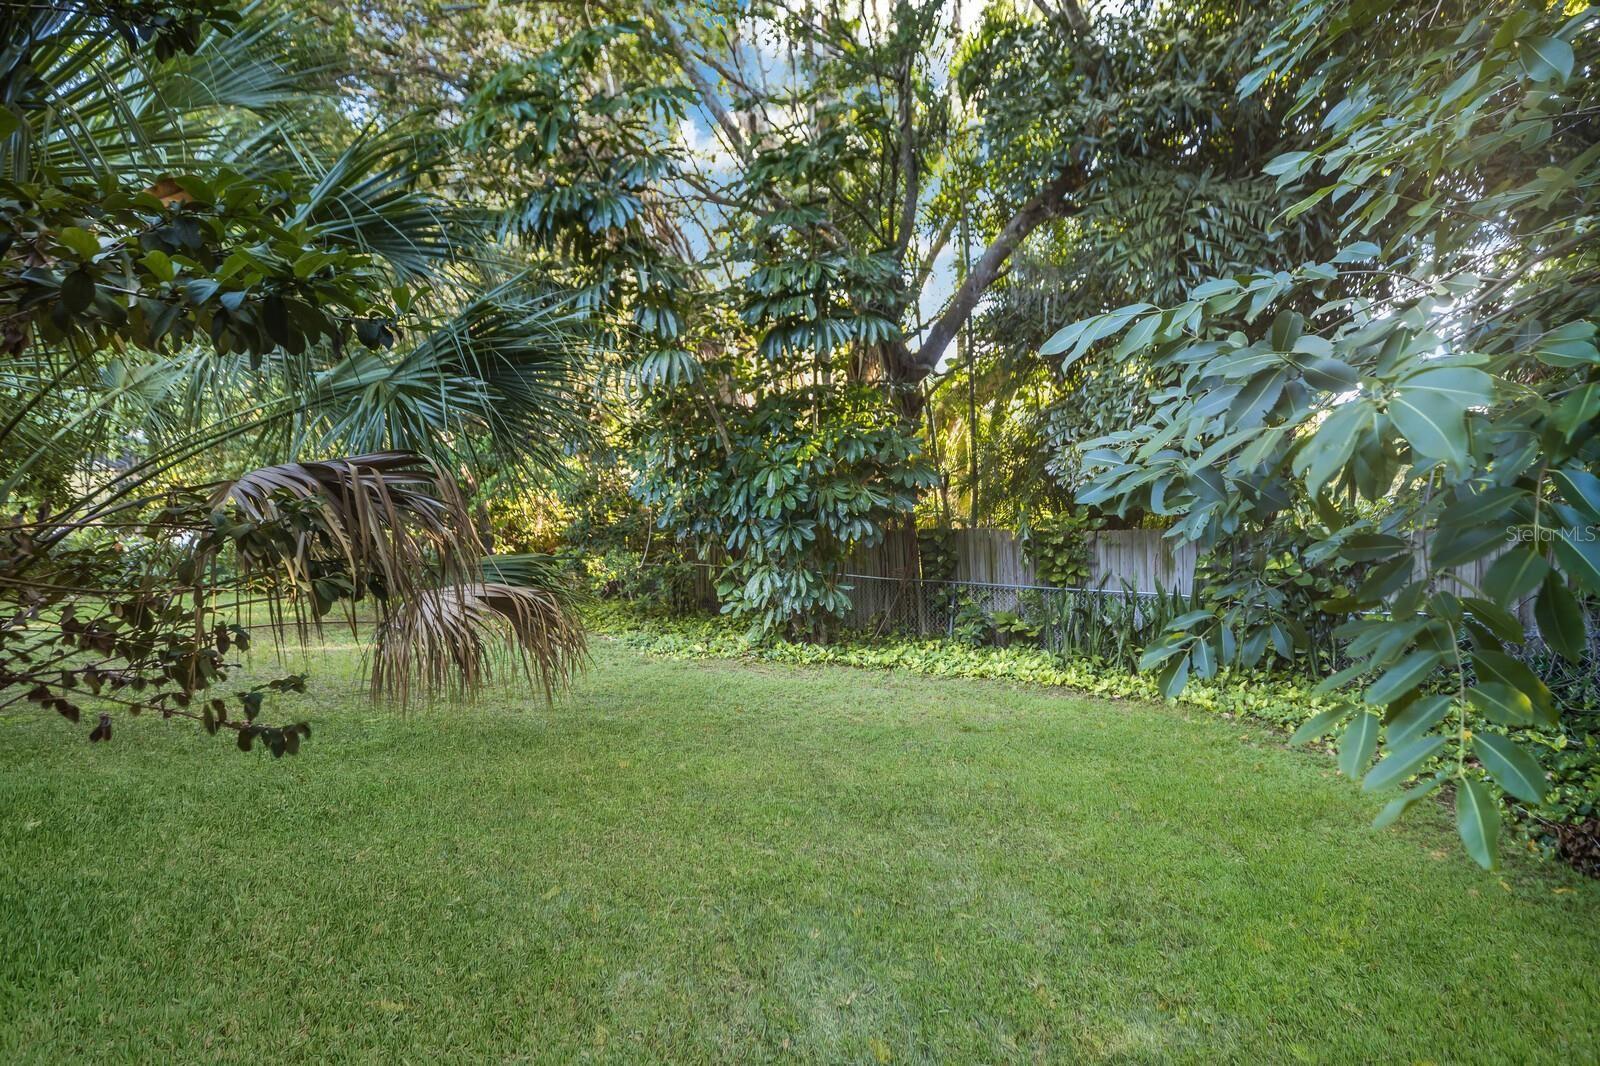 Photo of 1630 S ORANGE AVENUE, SARASOTA, FL 34239 (MLS # A4507005)